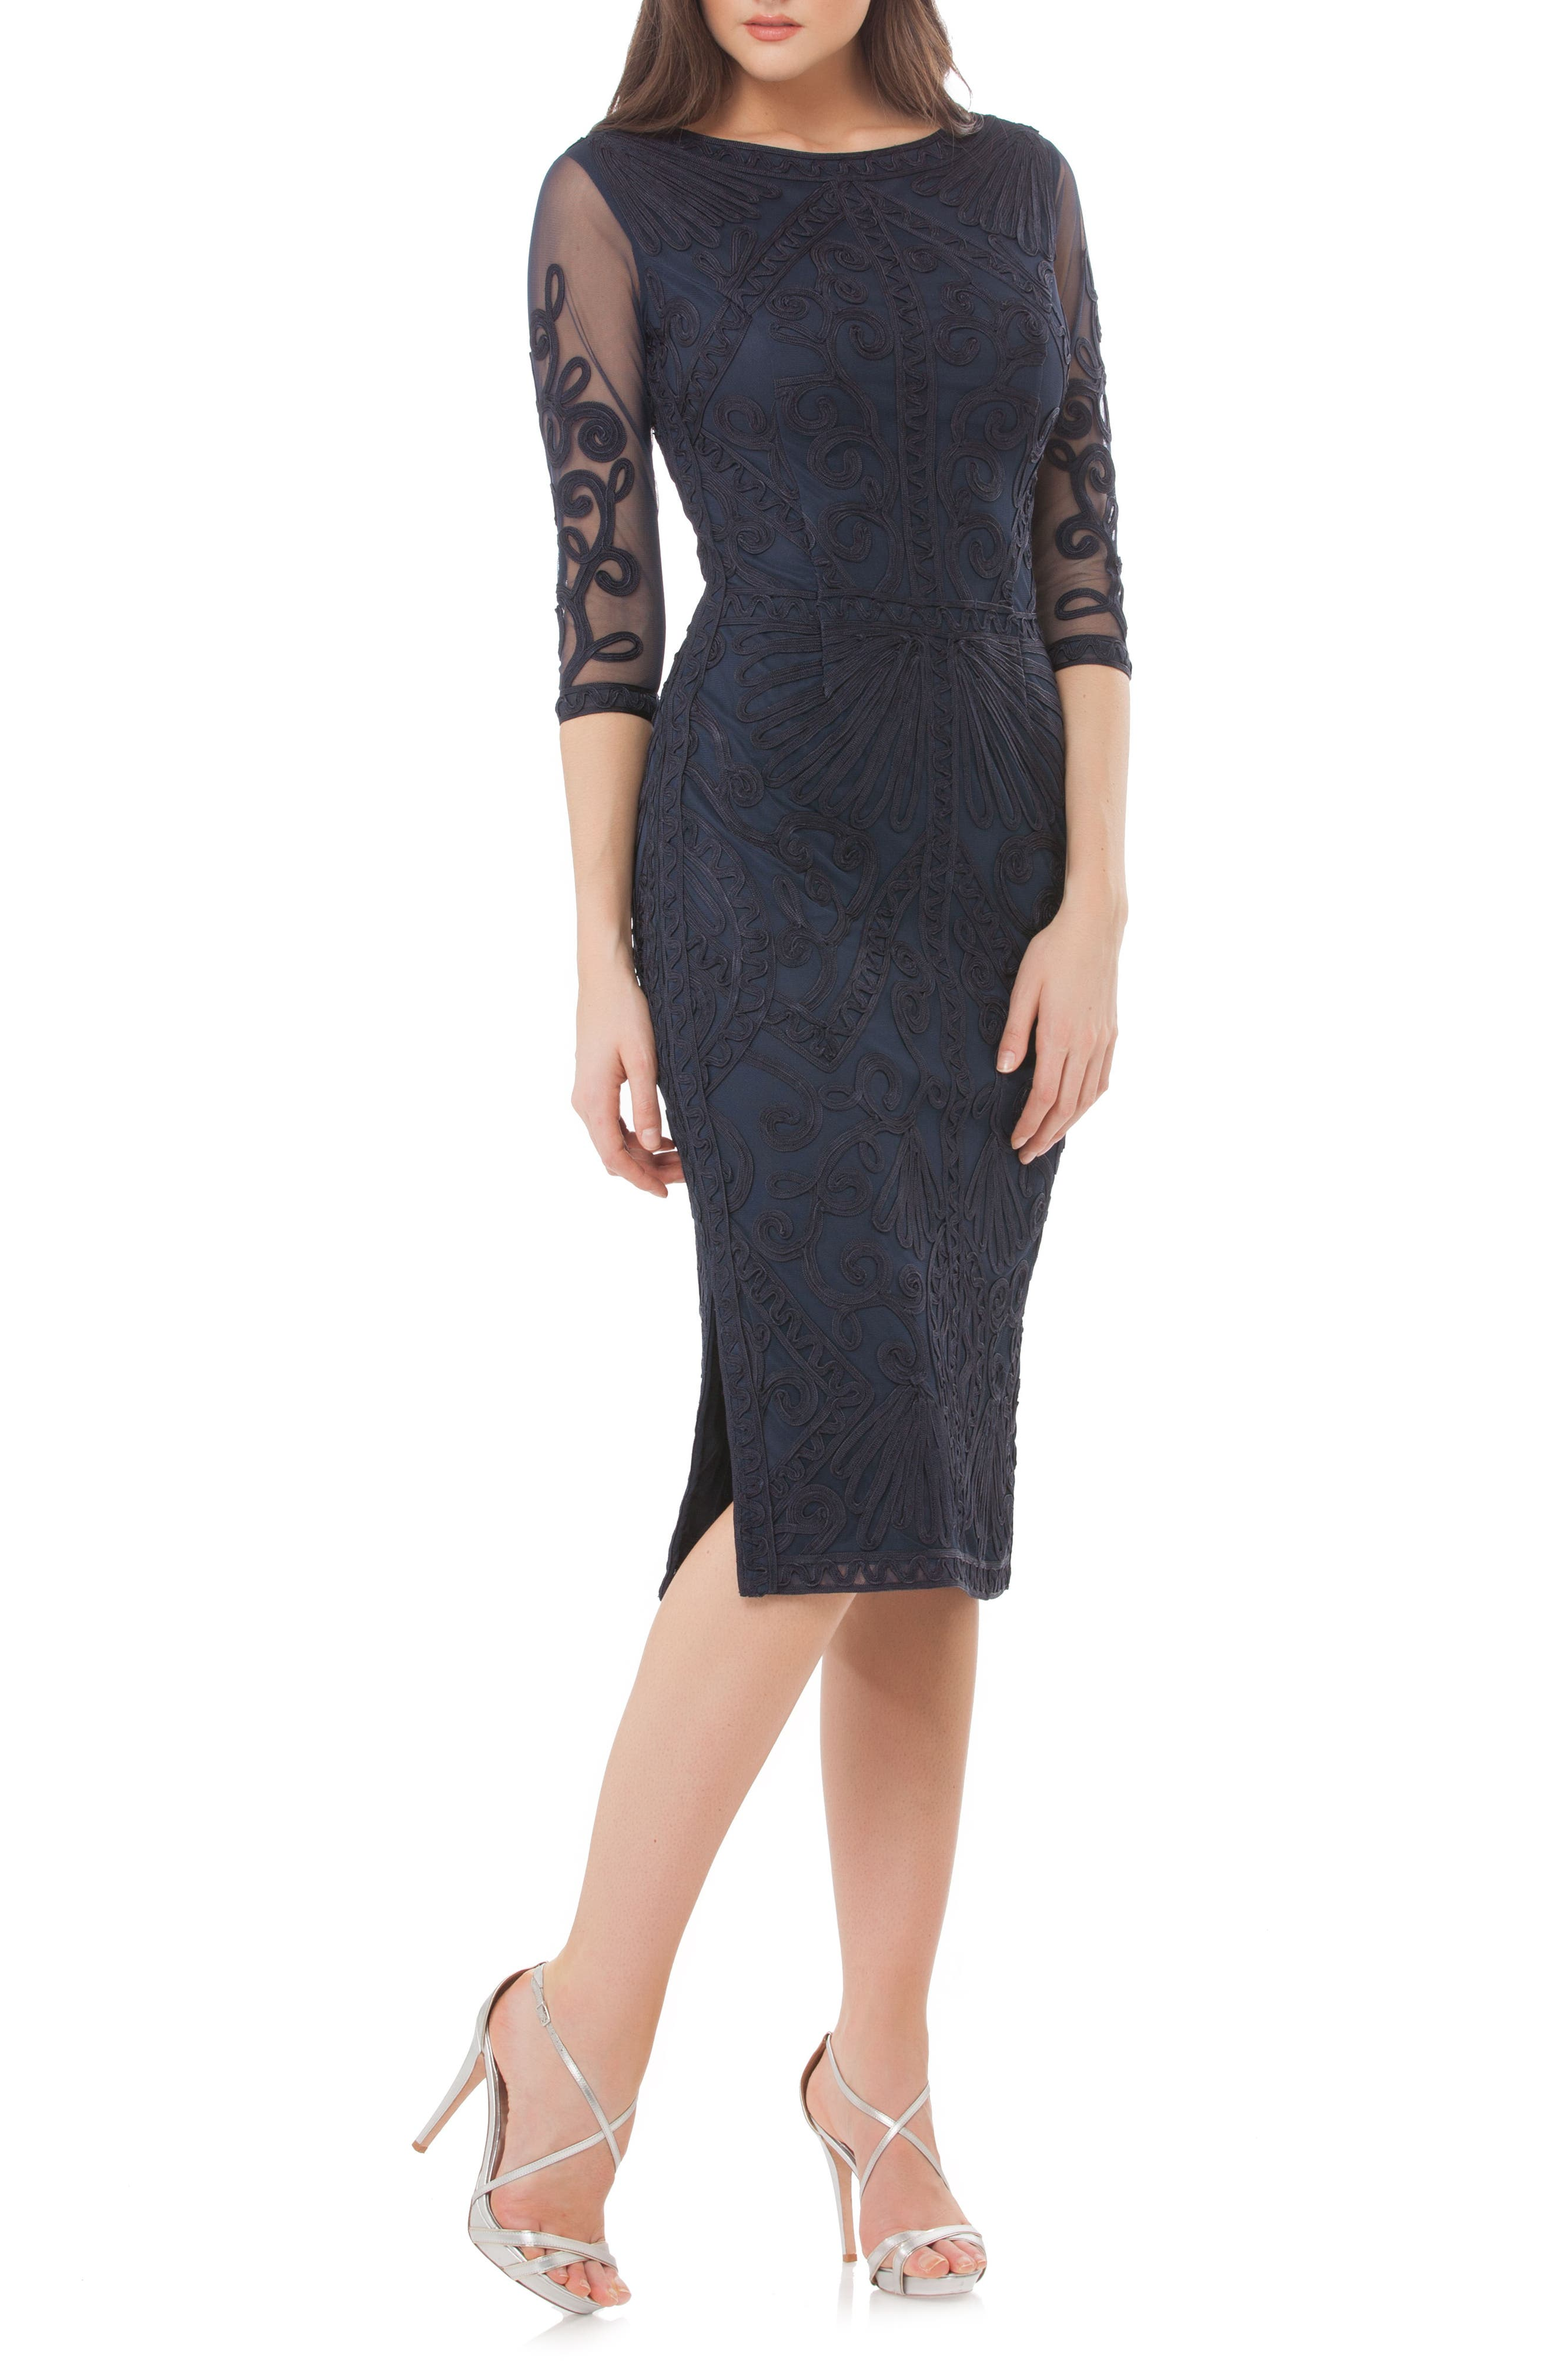 Js collections long mesh keyhole halter neck dress